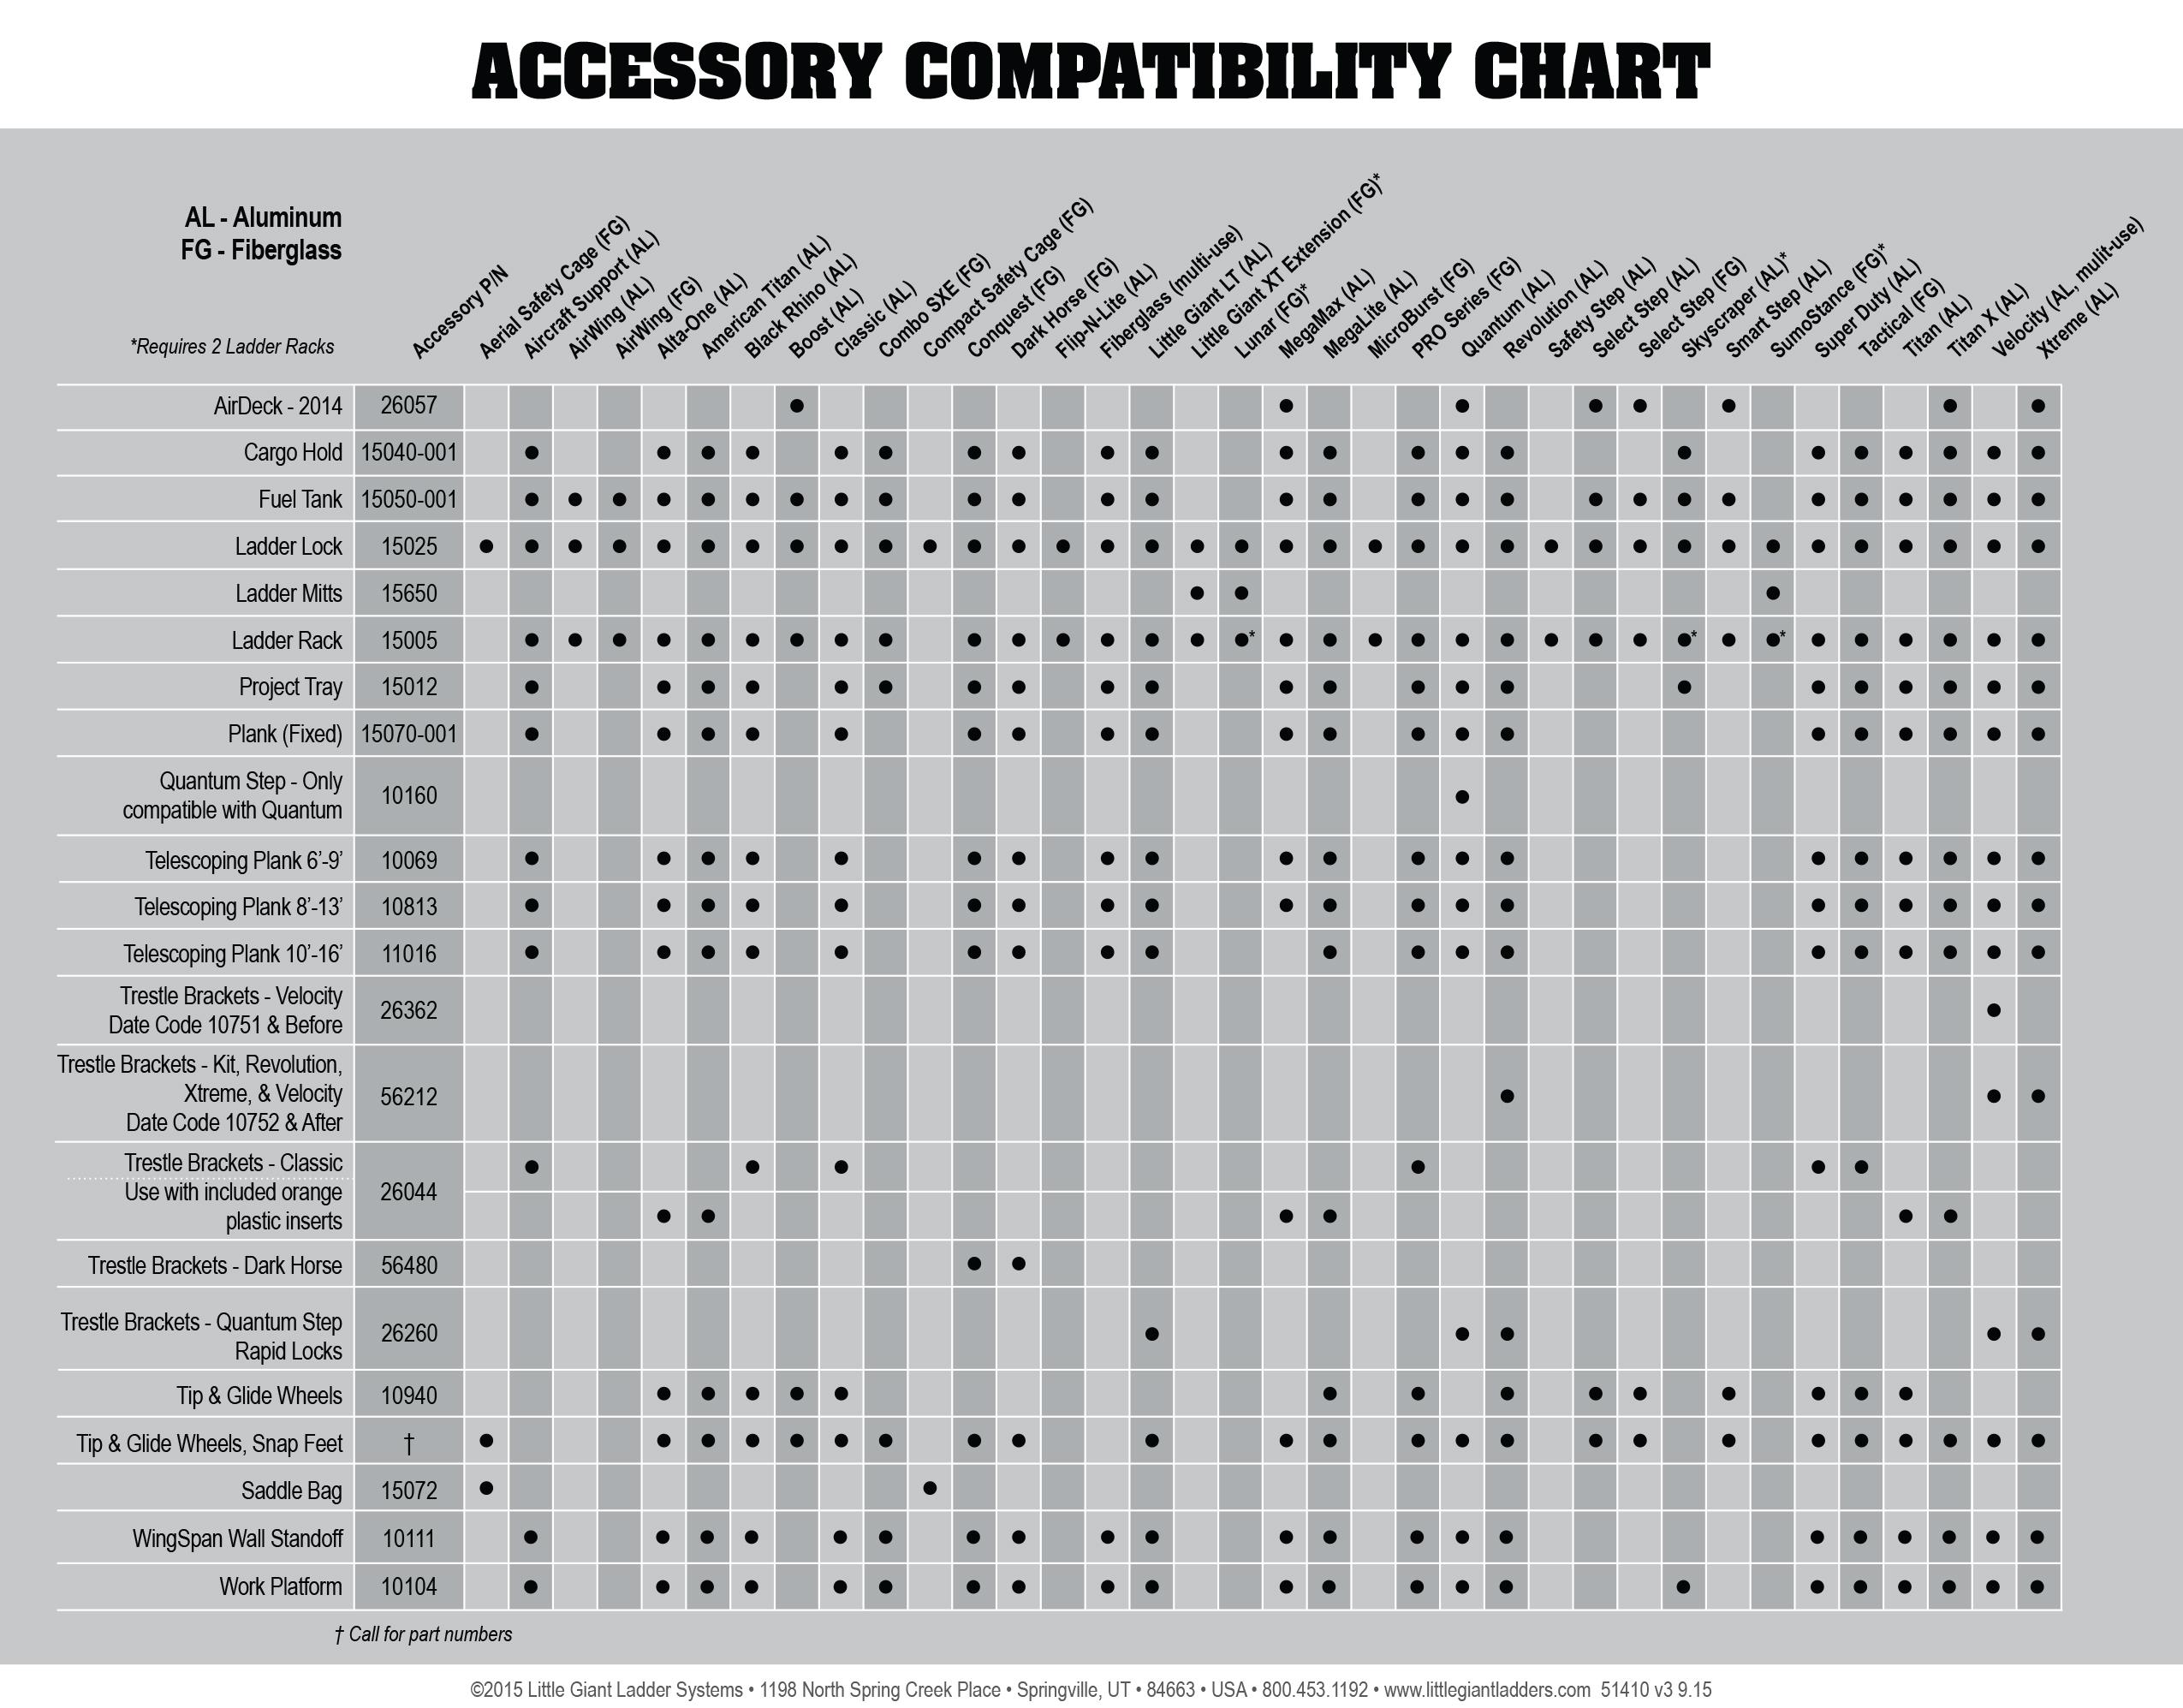 lg-accessory-chart.jpg